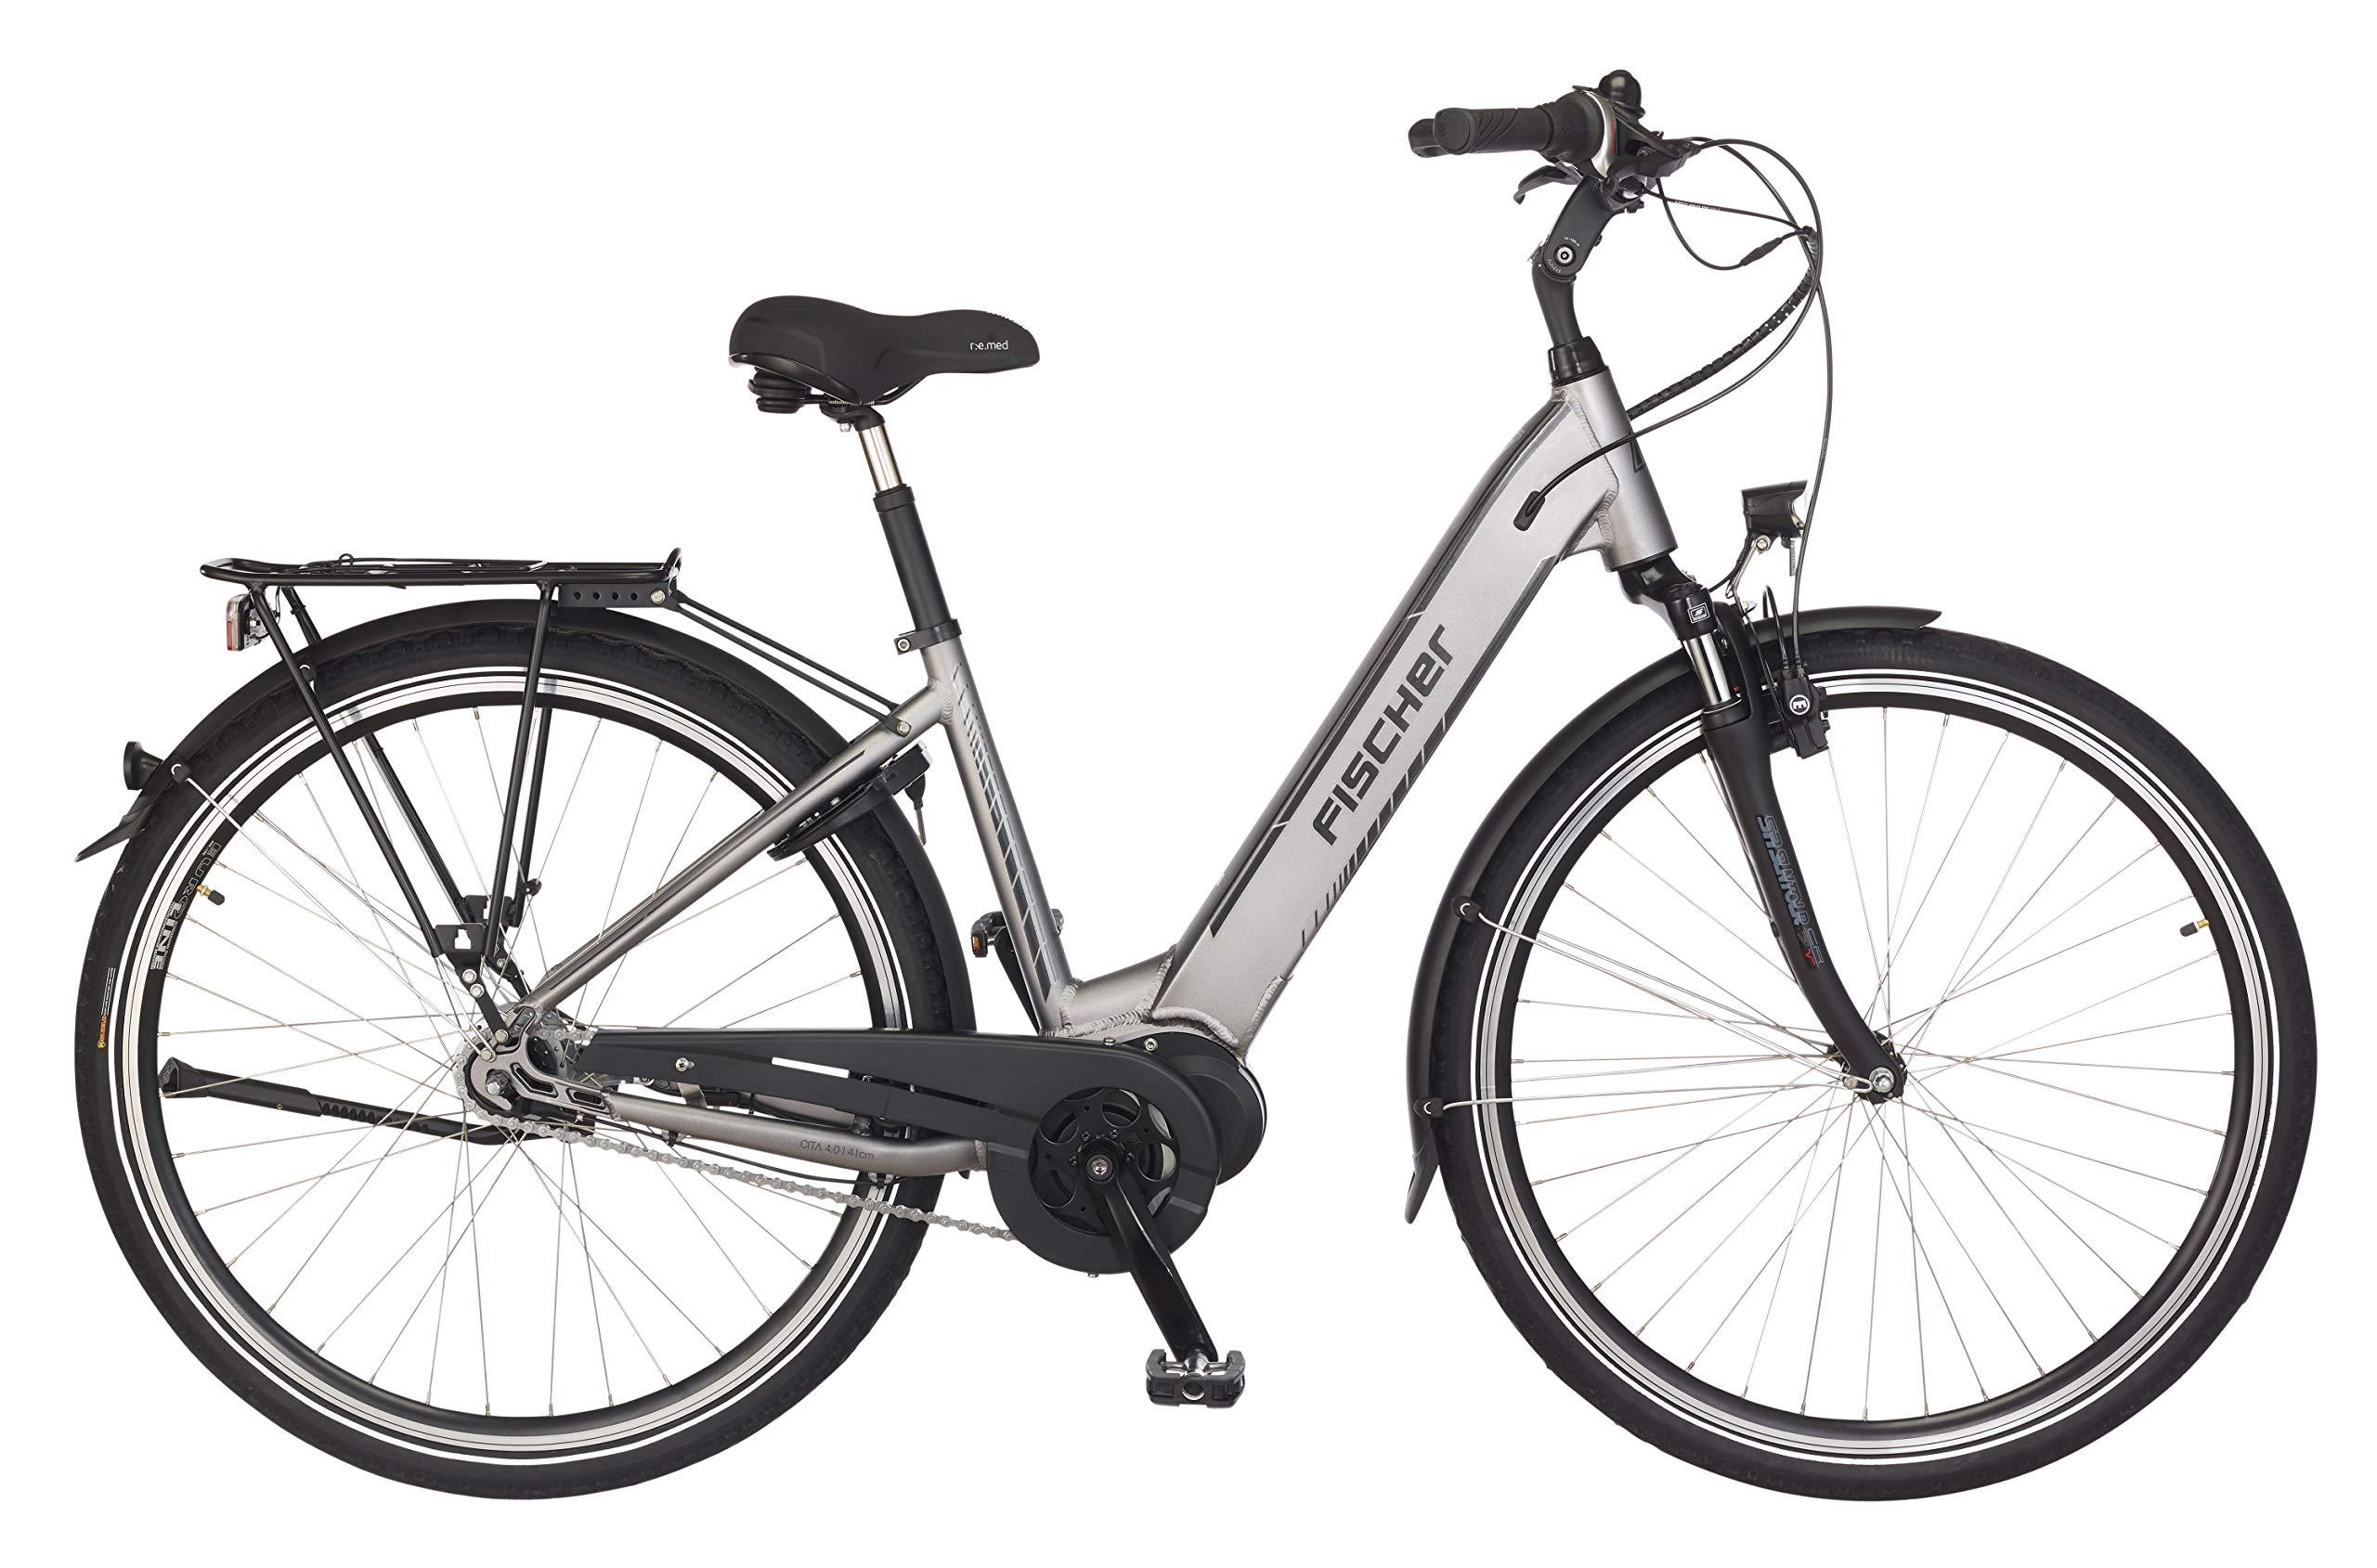 Fischer CITA 4.0i (2019), 28 Zoll Damen Trekking E-Bike, RH 41/44 cm, Mittelmotor, quarzgrau